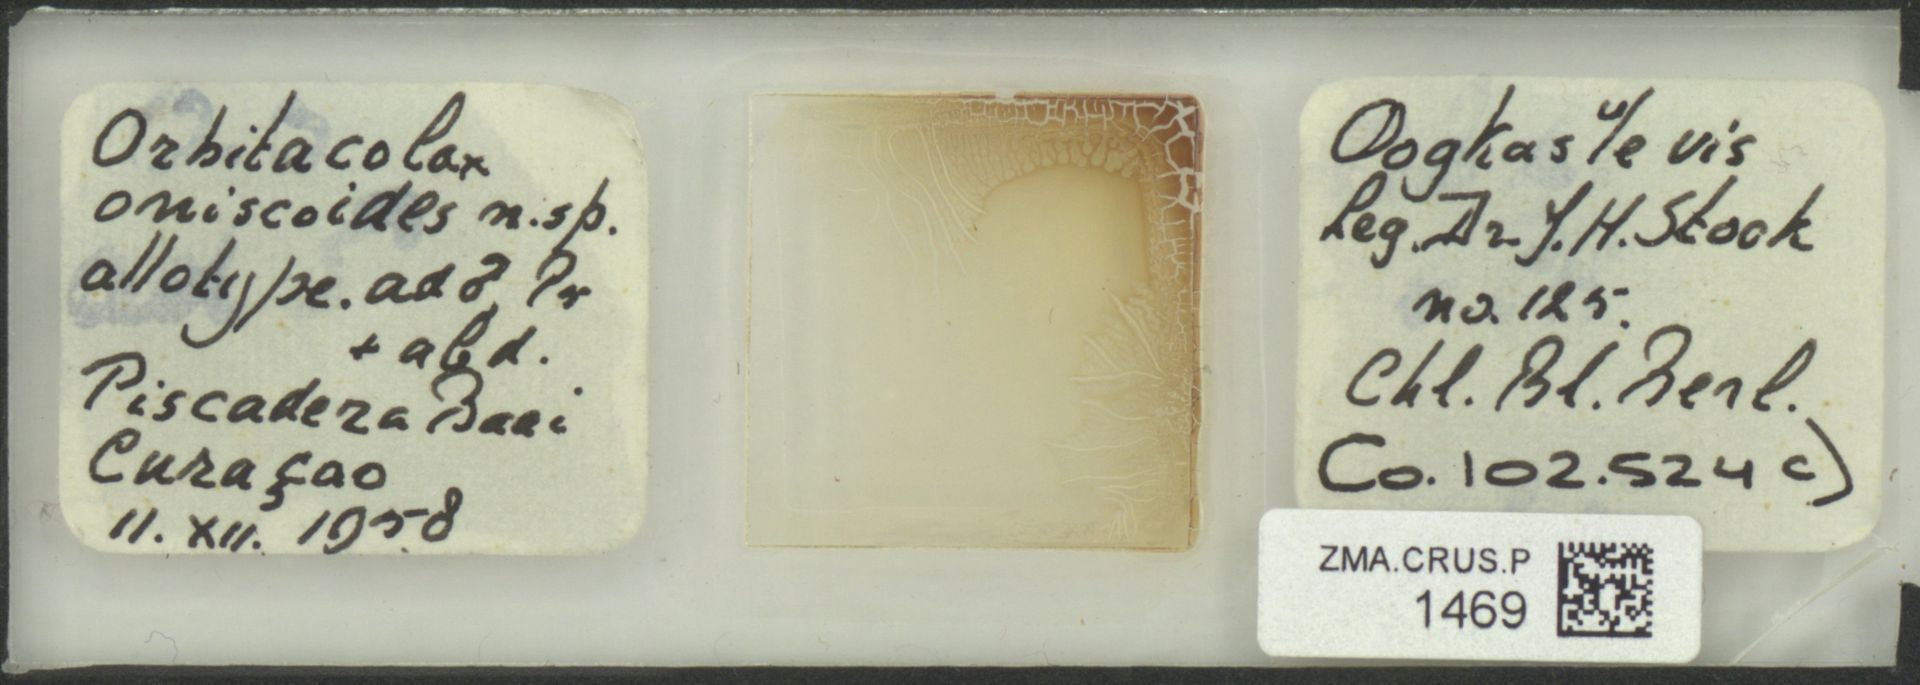 ZMA.CRUS.P.1469 | Orbitocolax oniscoides